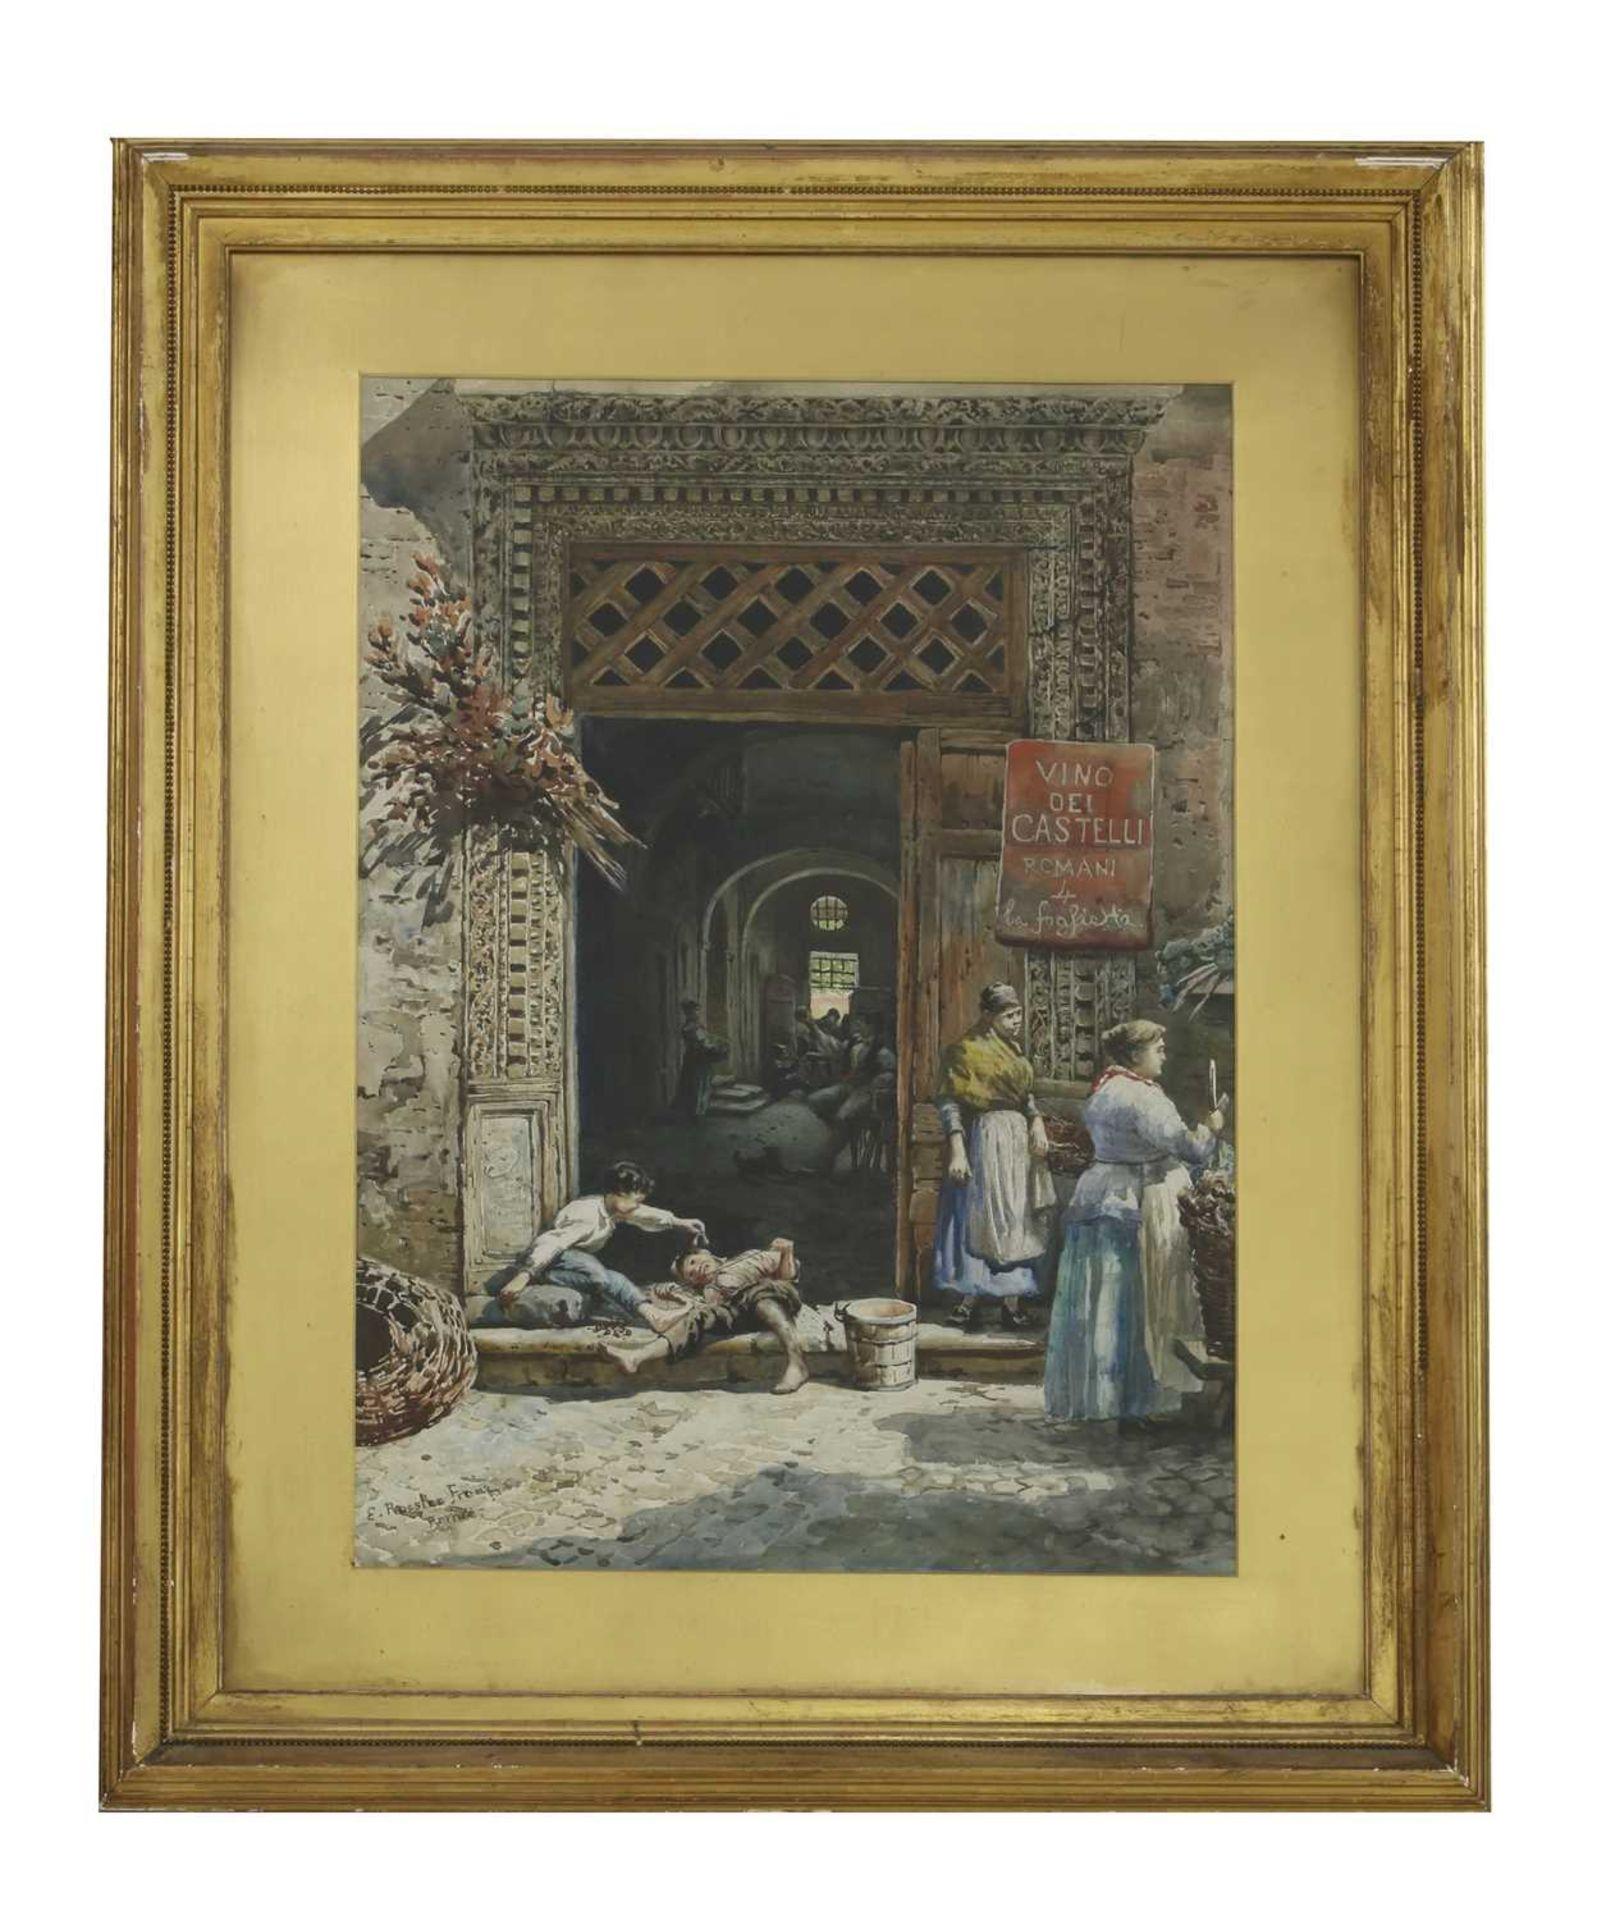 Ettore Roesler Franz (Italian, 1845-1907) - Image 3 of 10